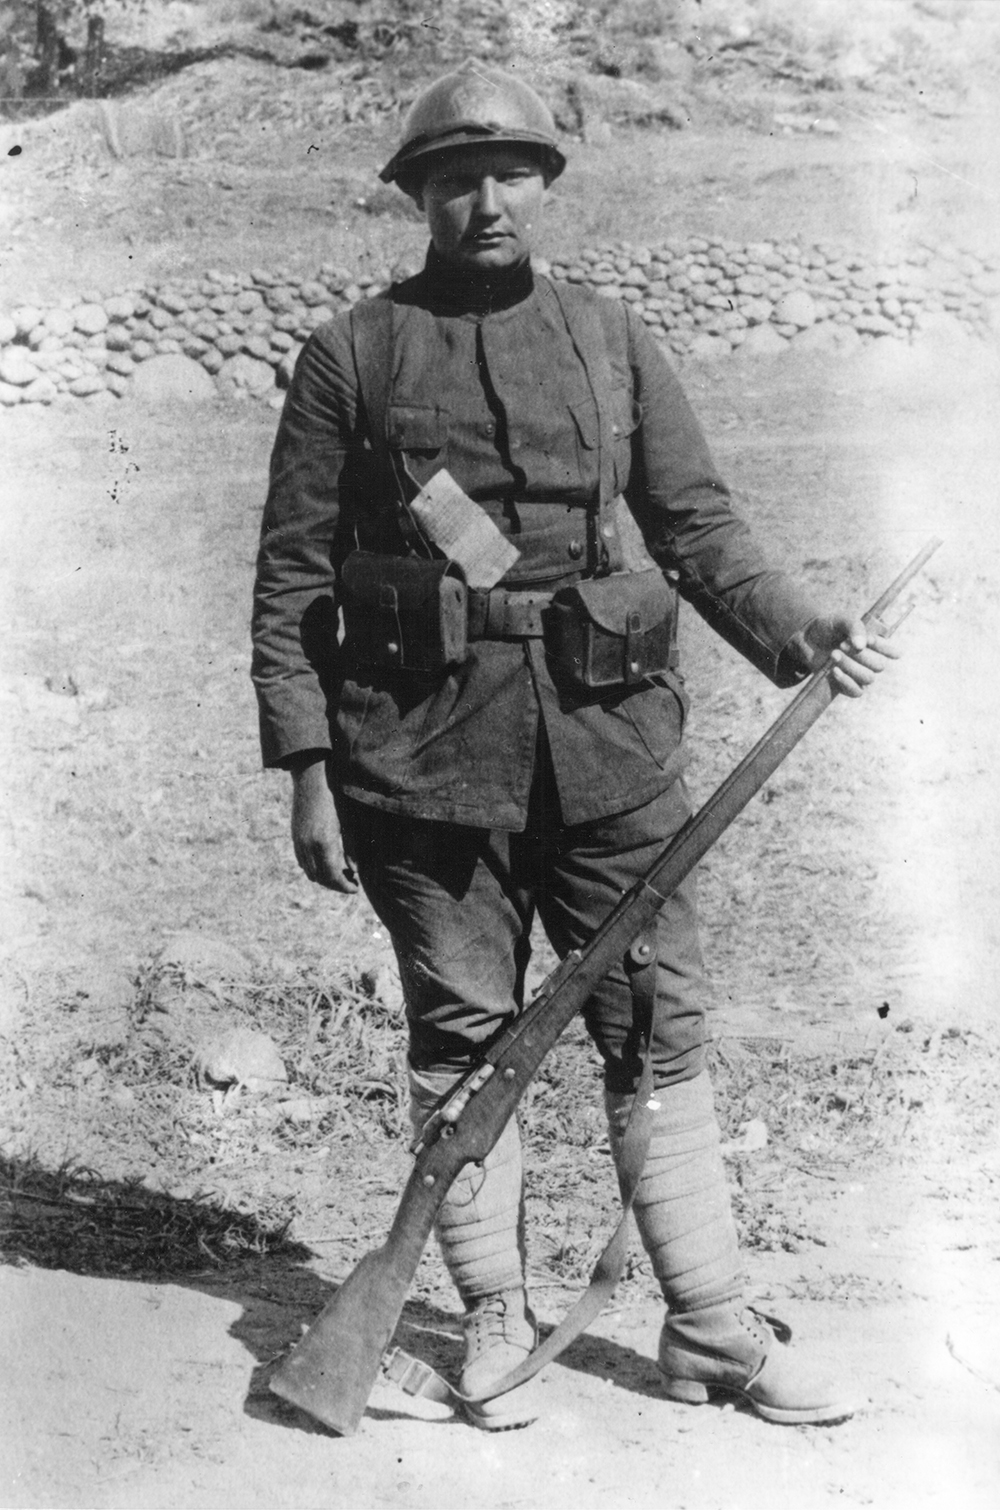 Milunka Savic, la combattante